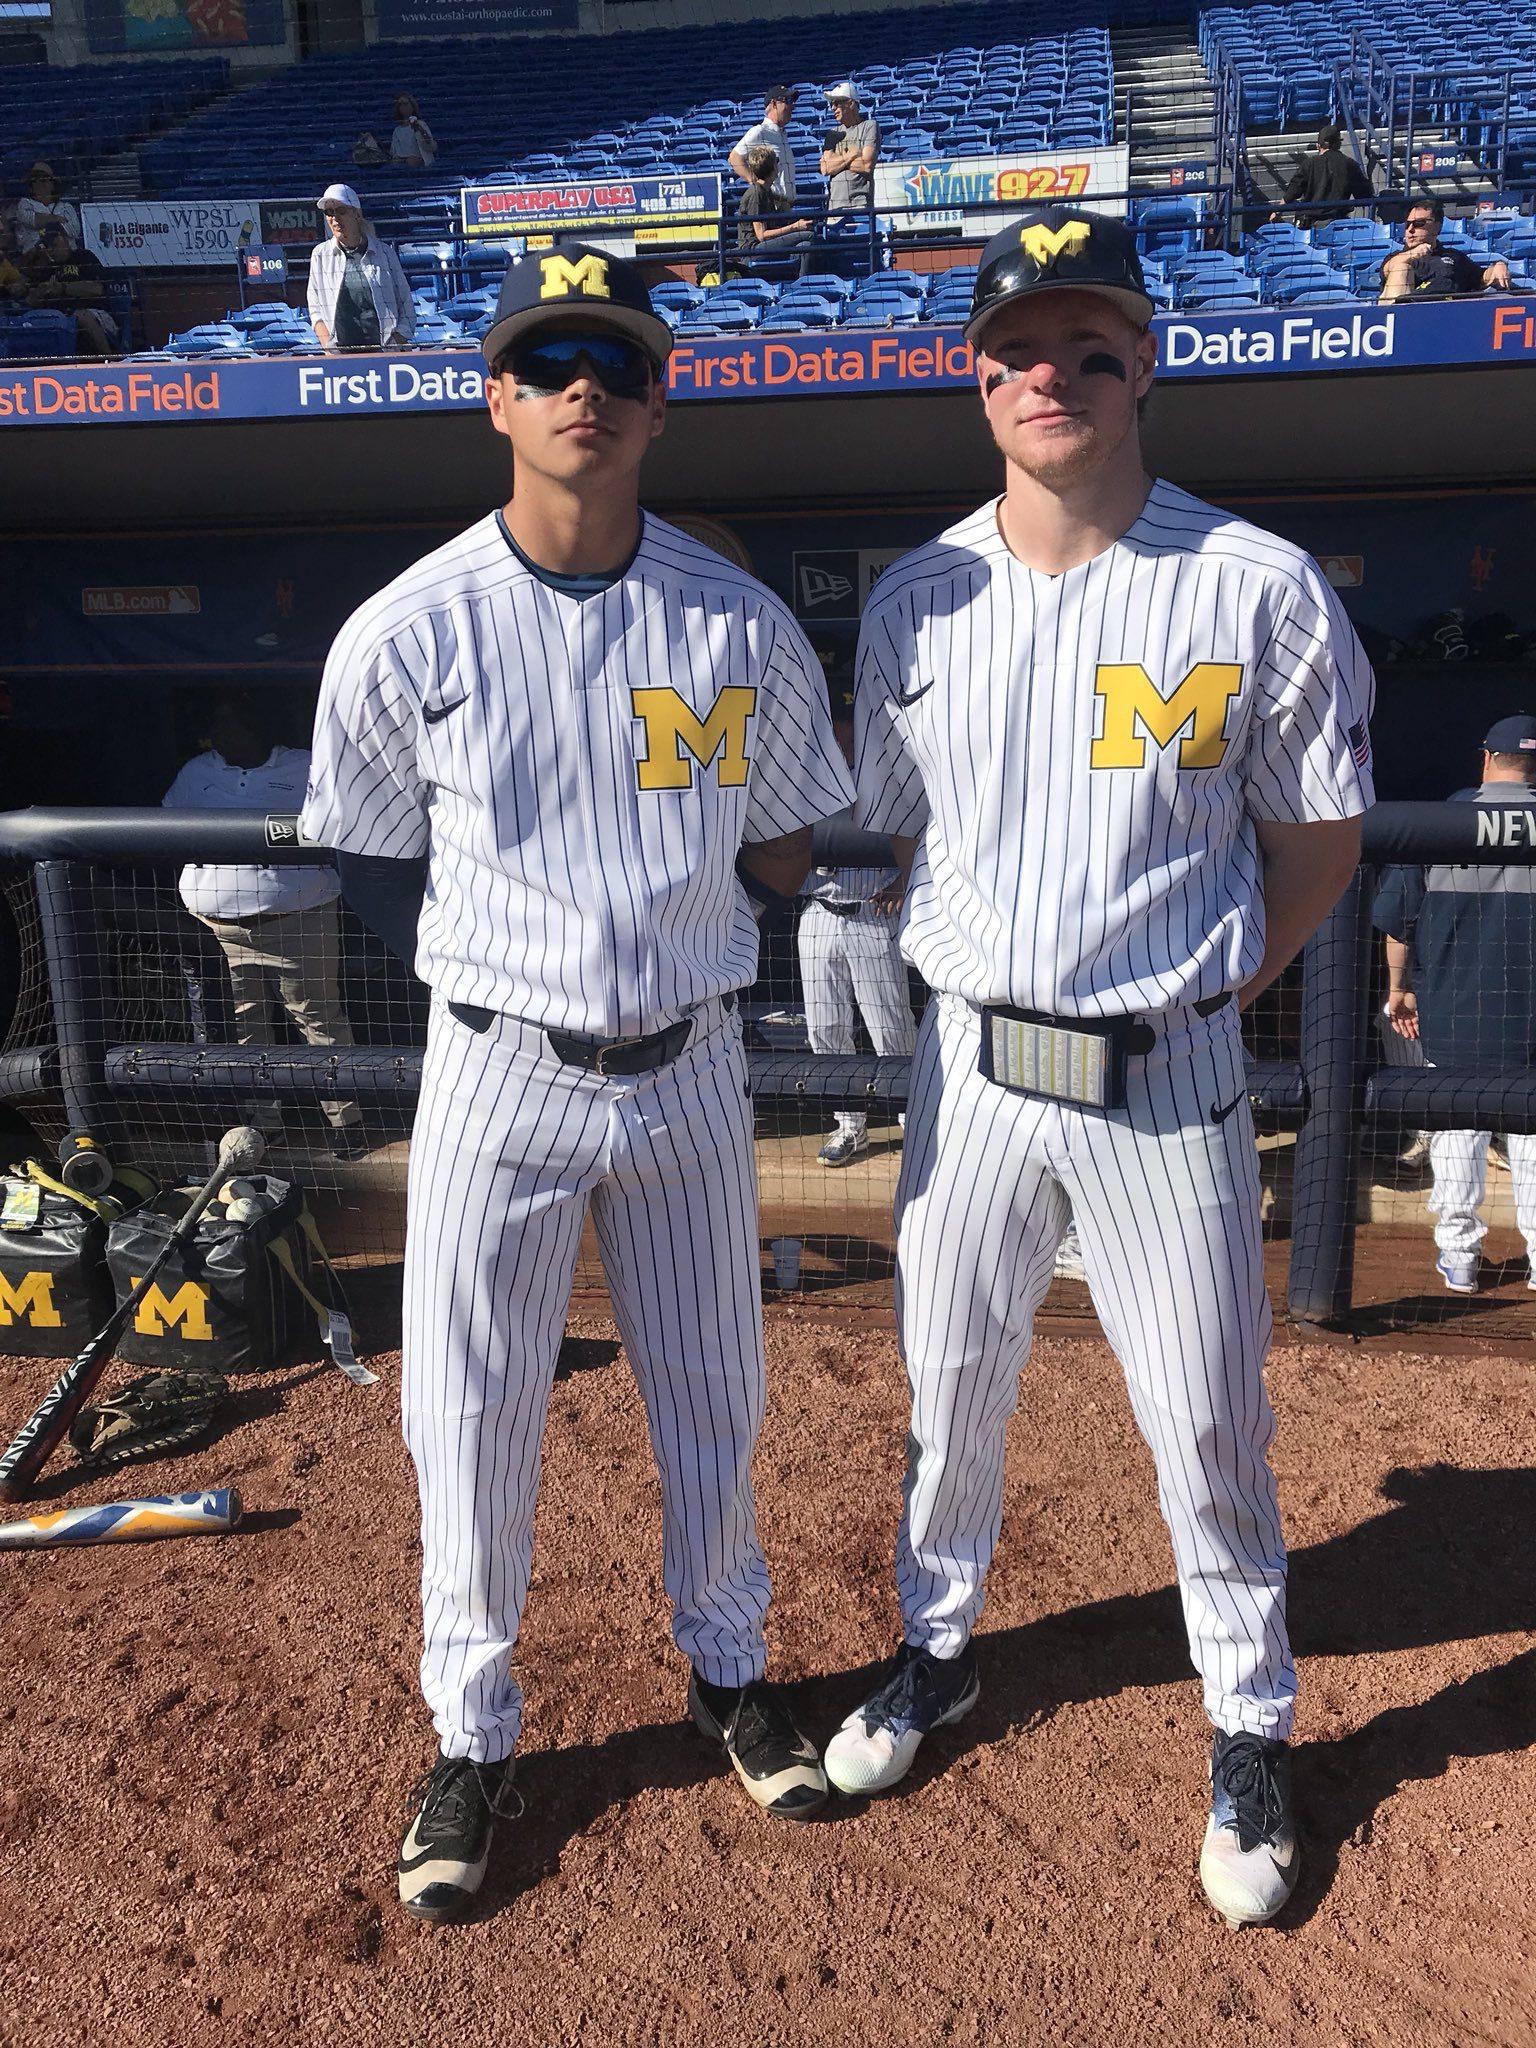 Uniformity College Baseball S New Threads D1baseball